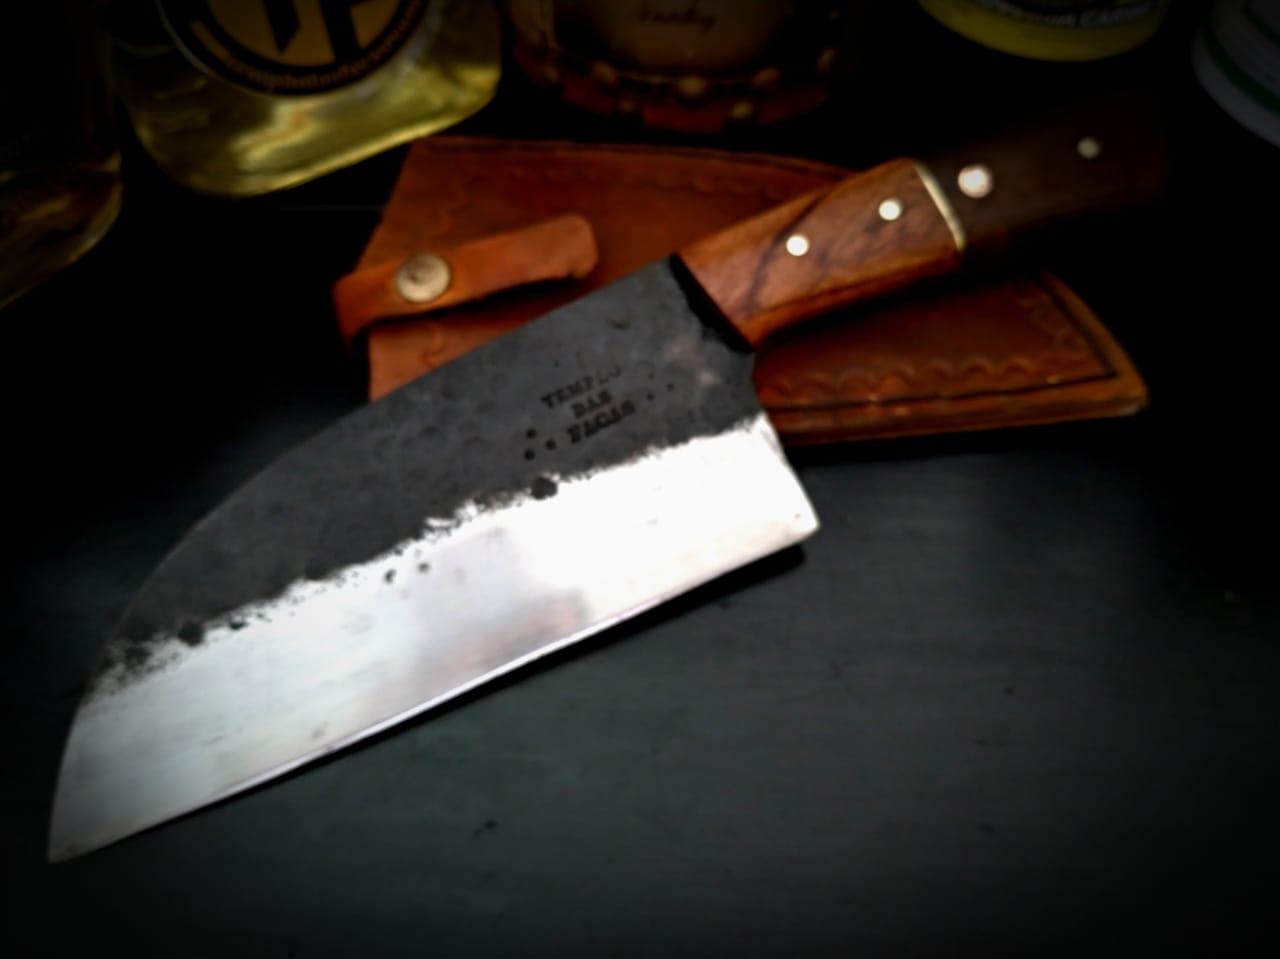 Faca artesanal chef saratov full tang